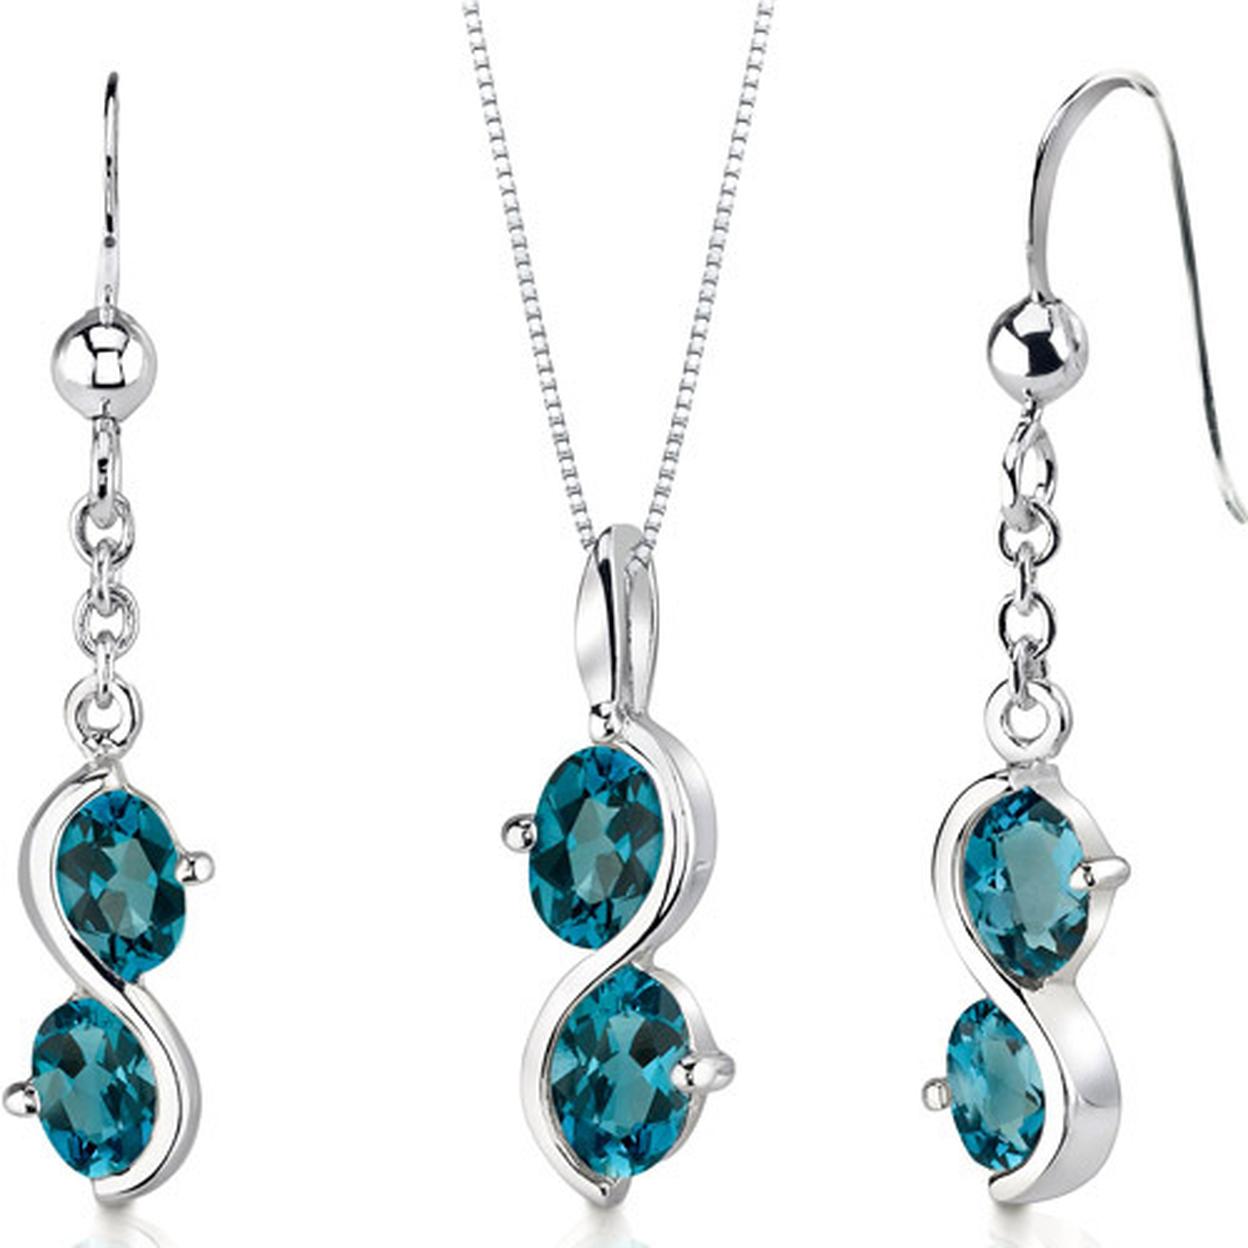 2 Stone 3.75 Carats Oval Shape Sterling Silver London Blue Topaz Pendant Earrings Set Style Ss3398